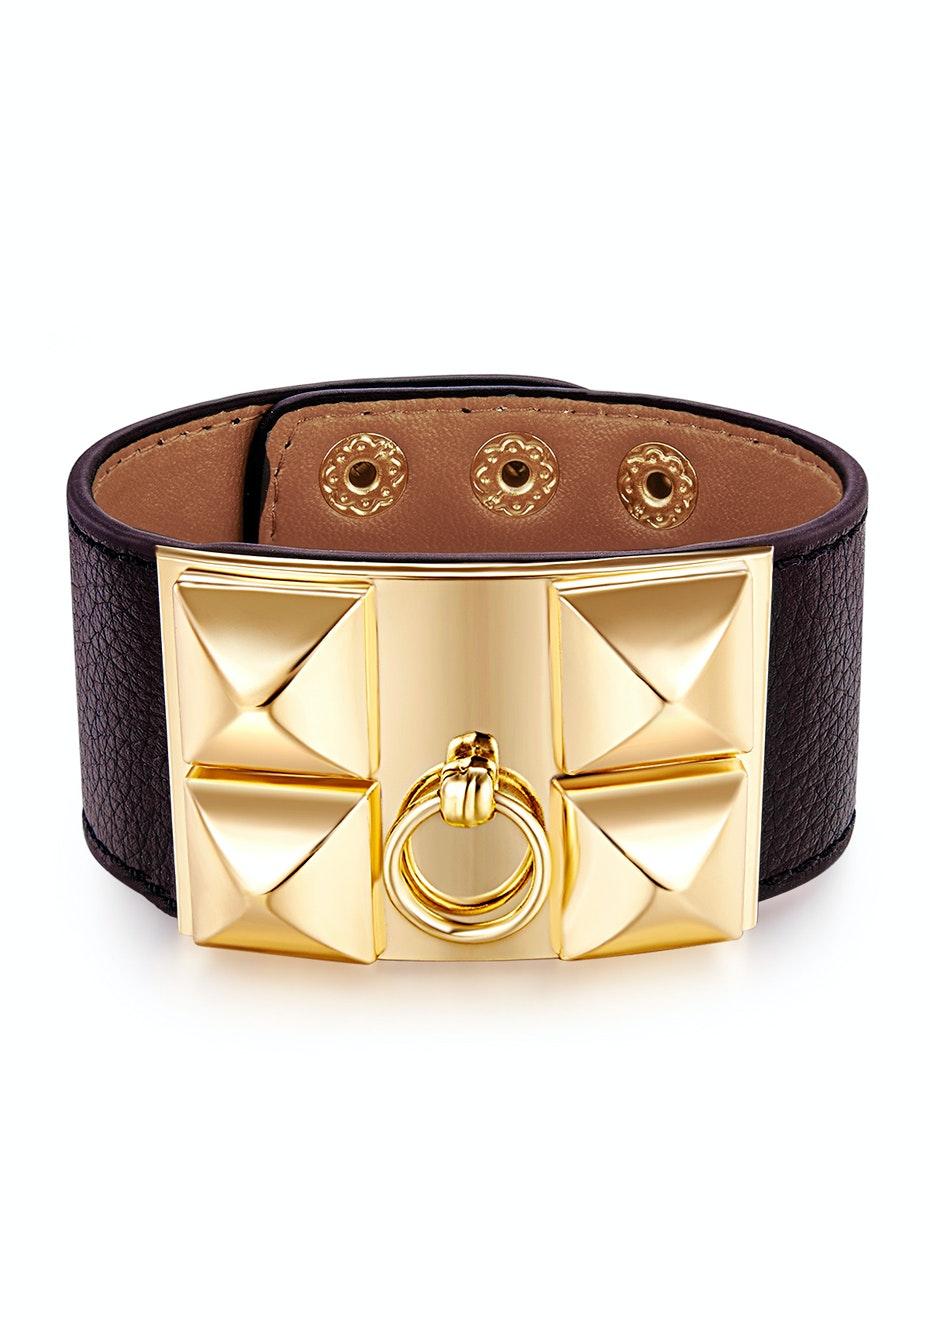 Genuine Cow Leather Studded Bracelet -BLK